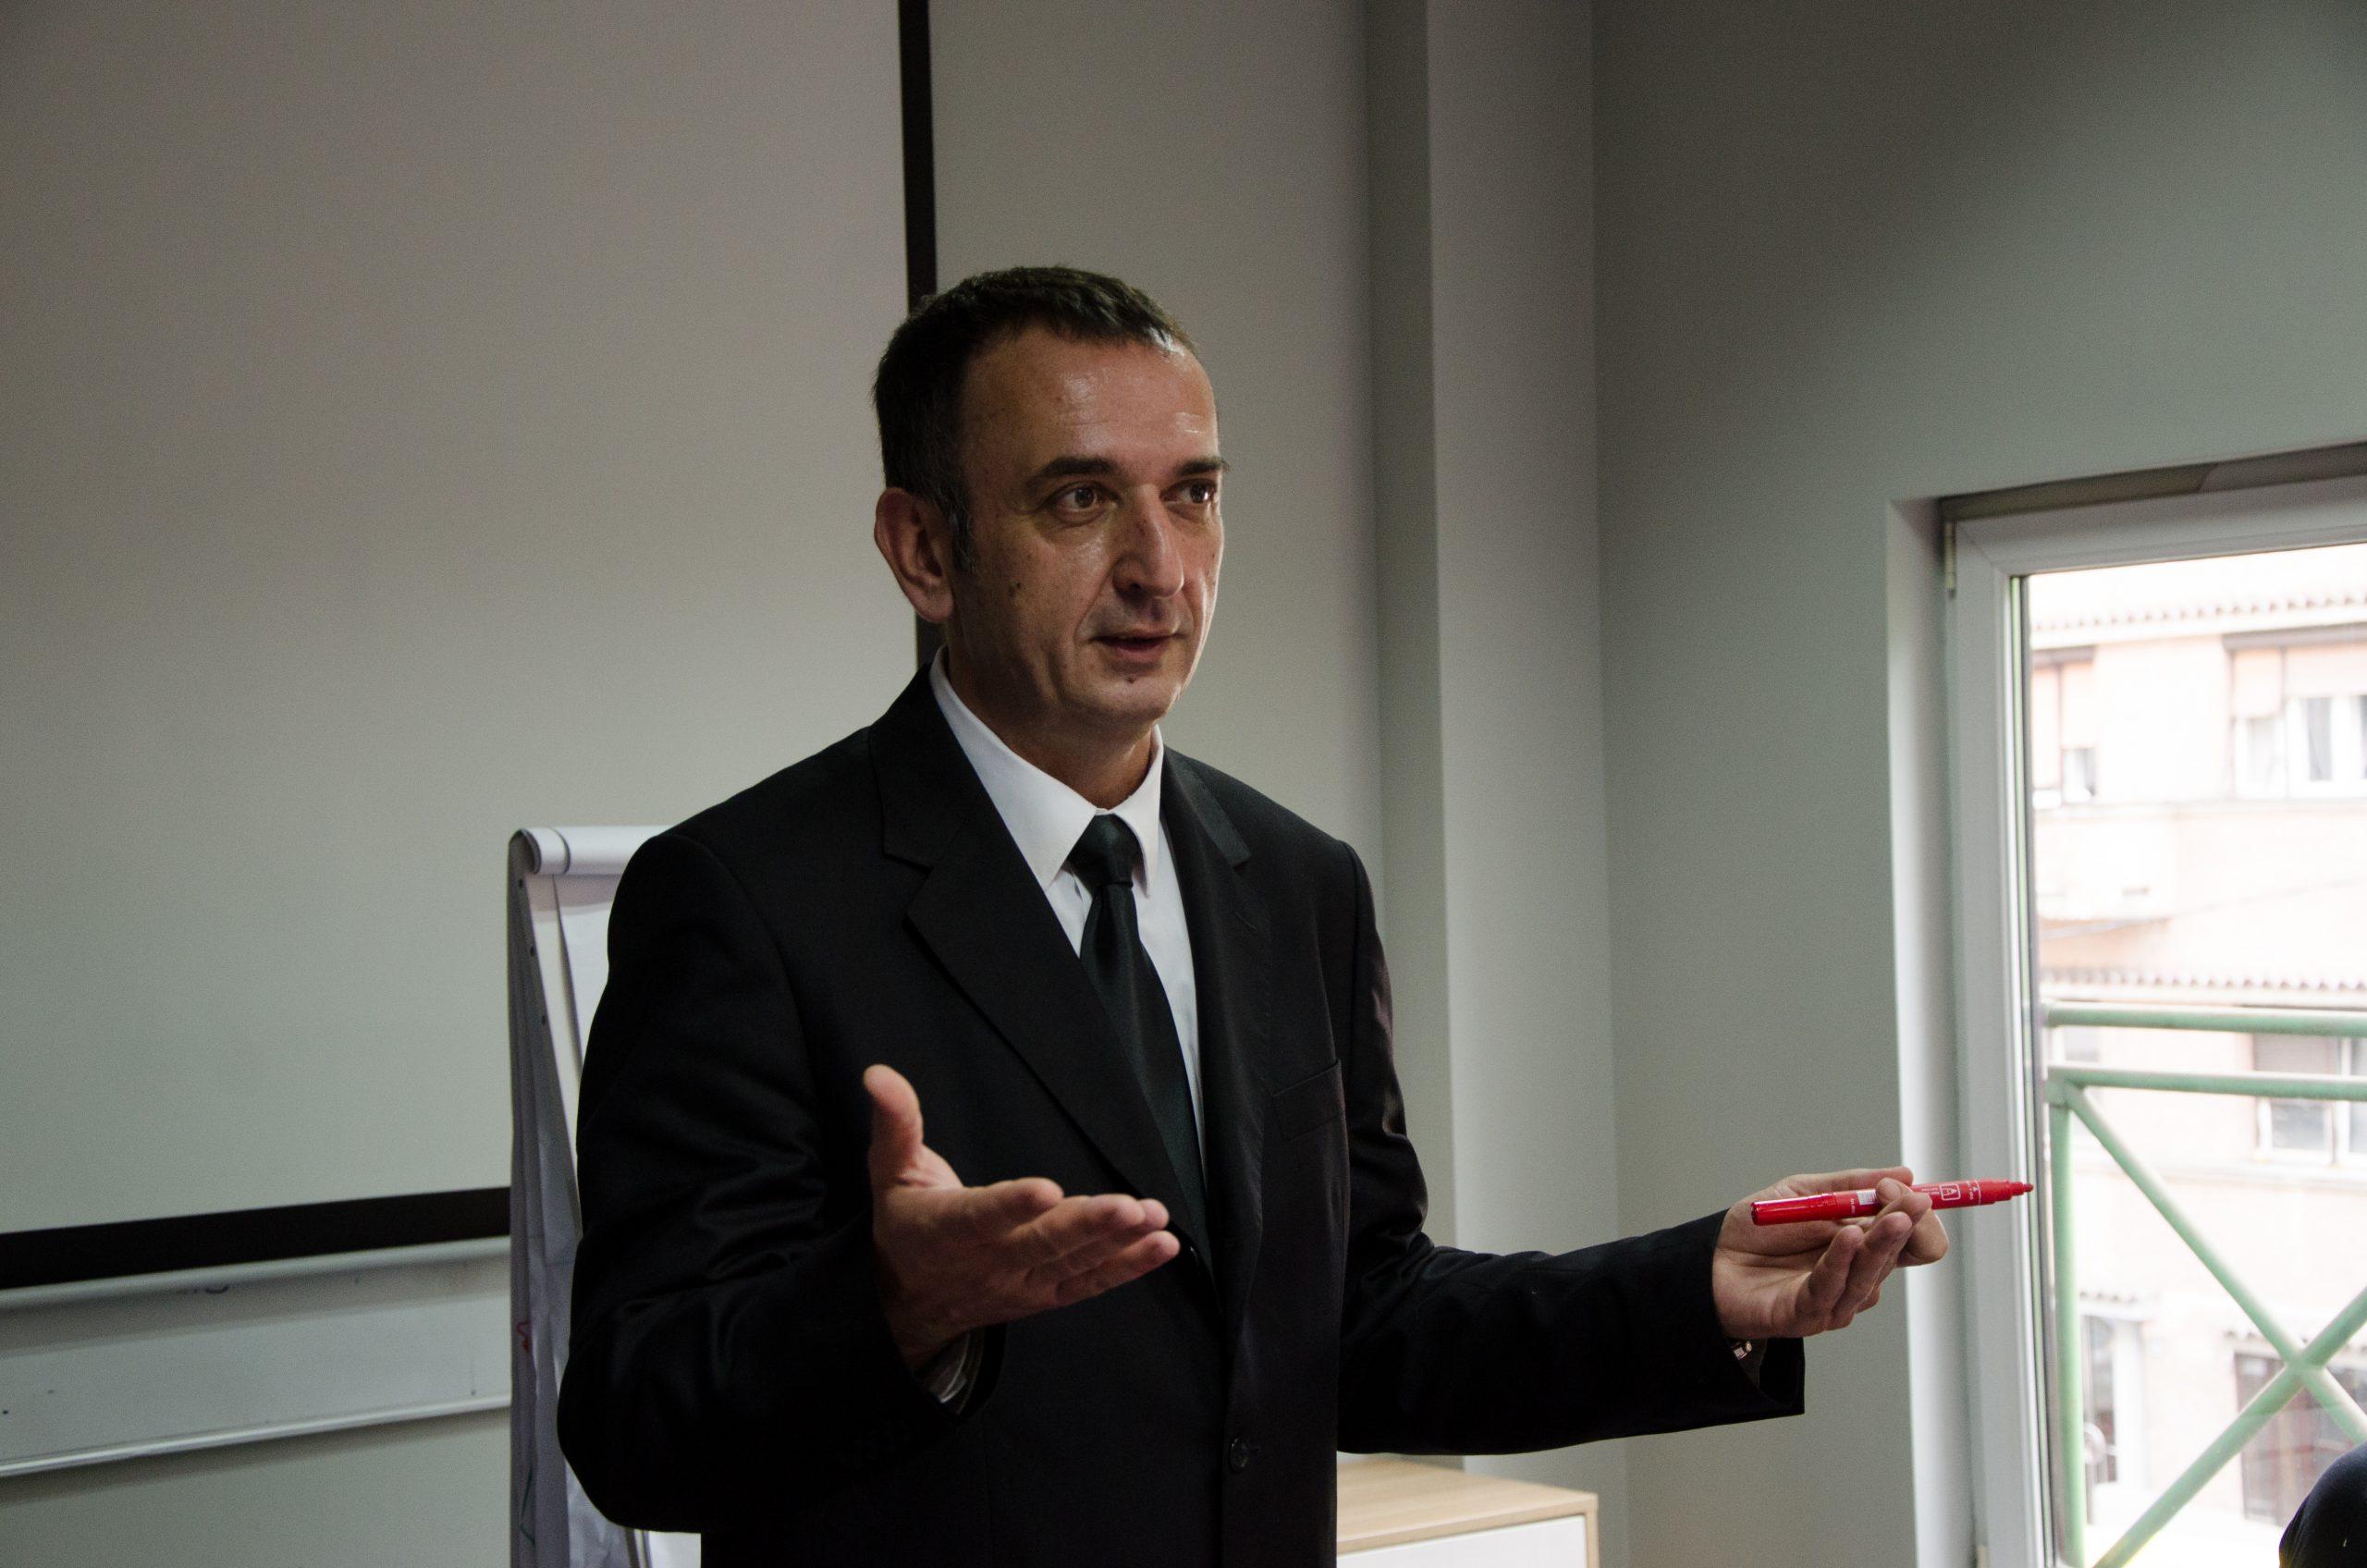 Dragan Savic